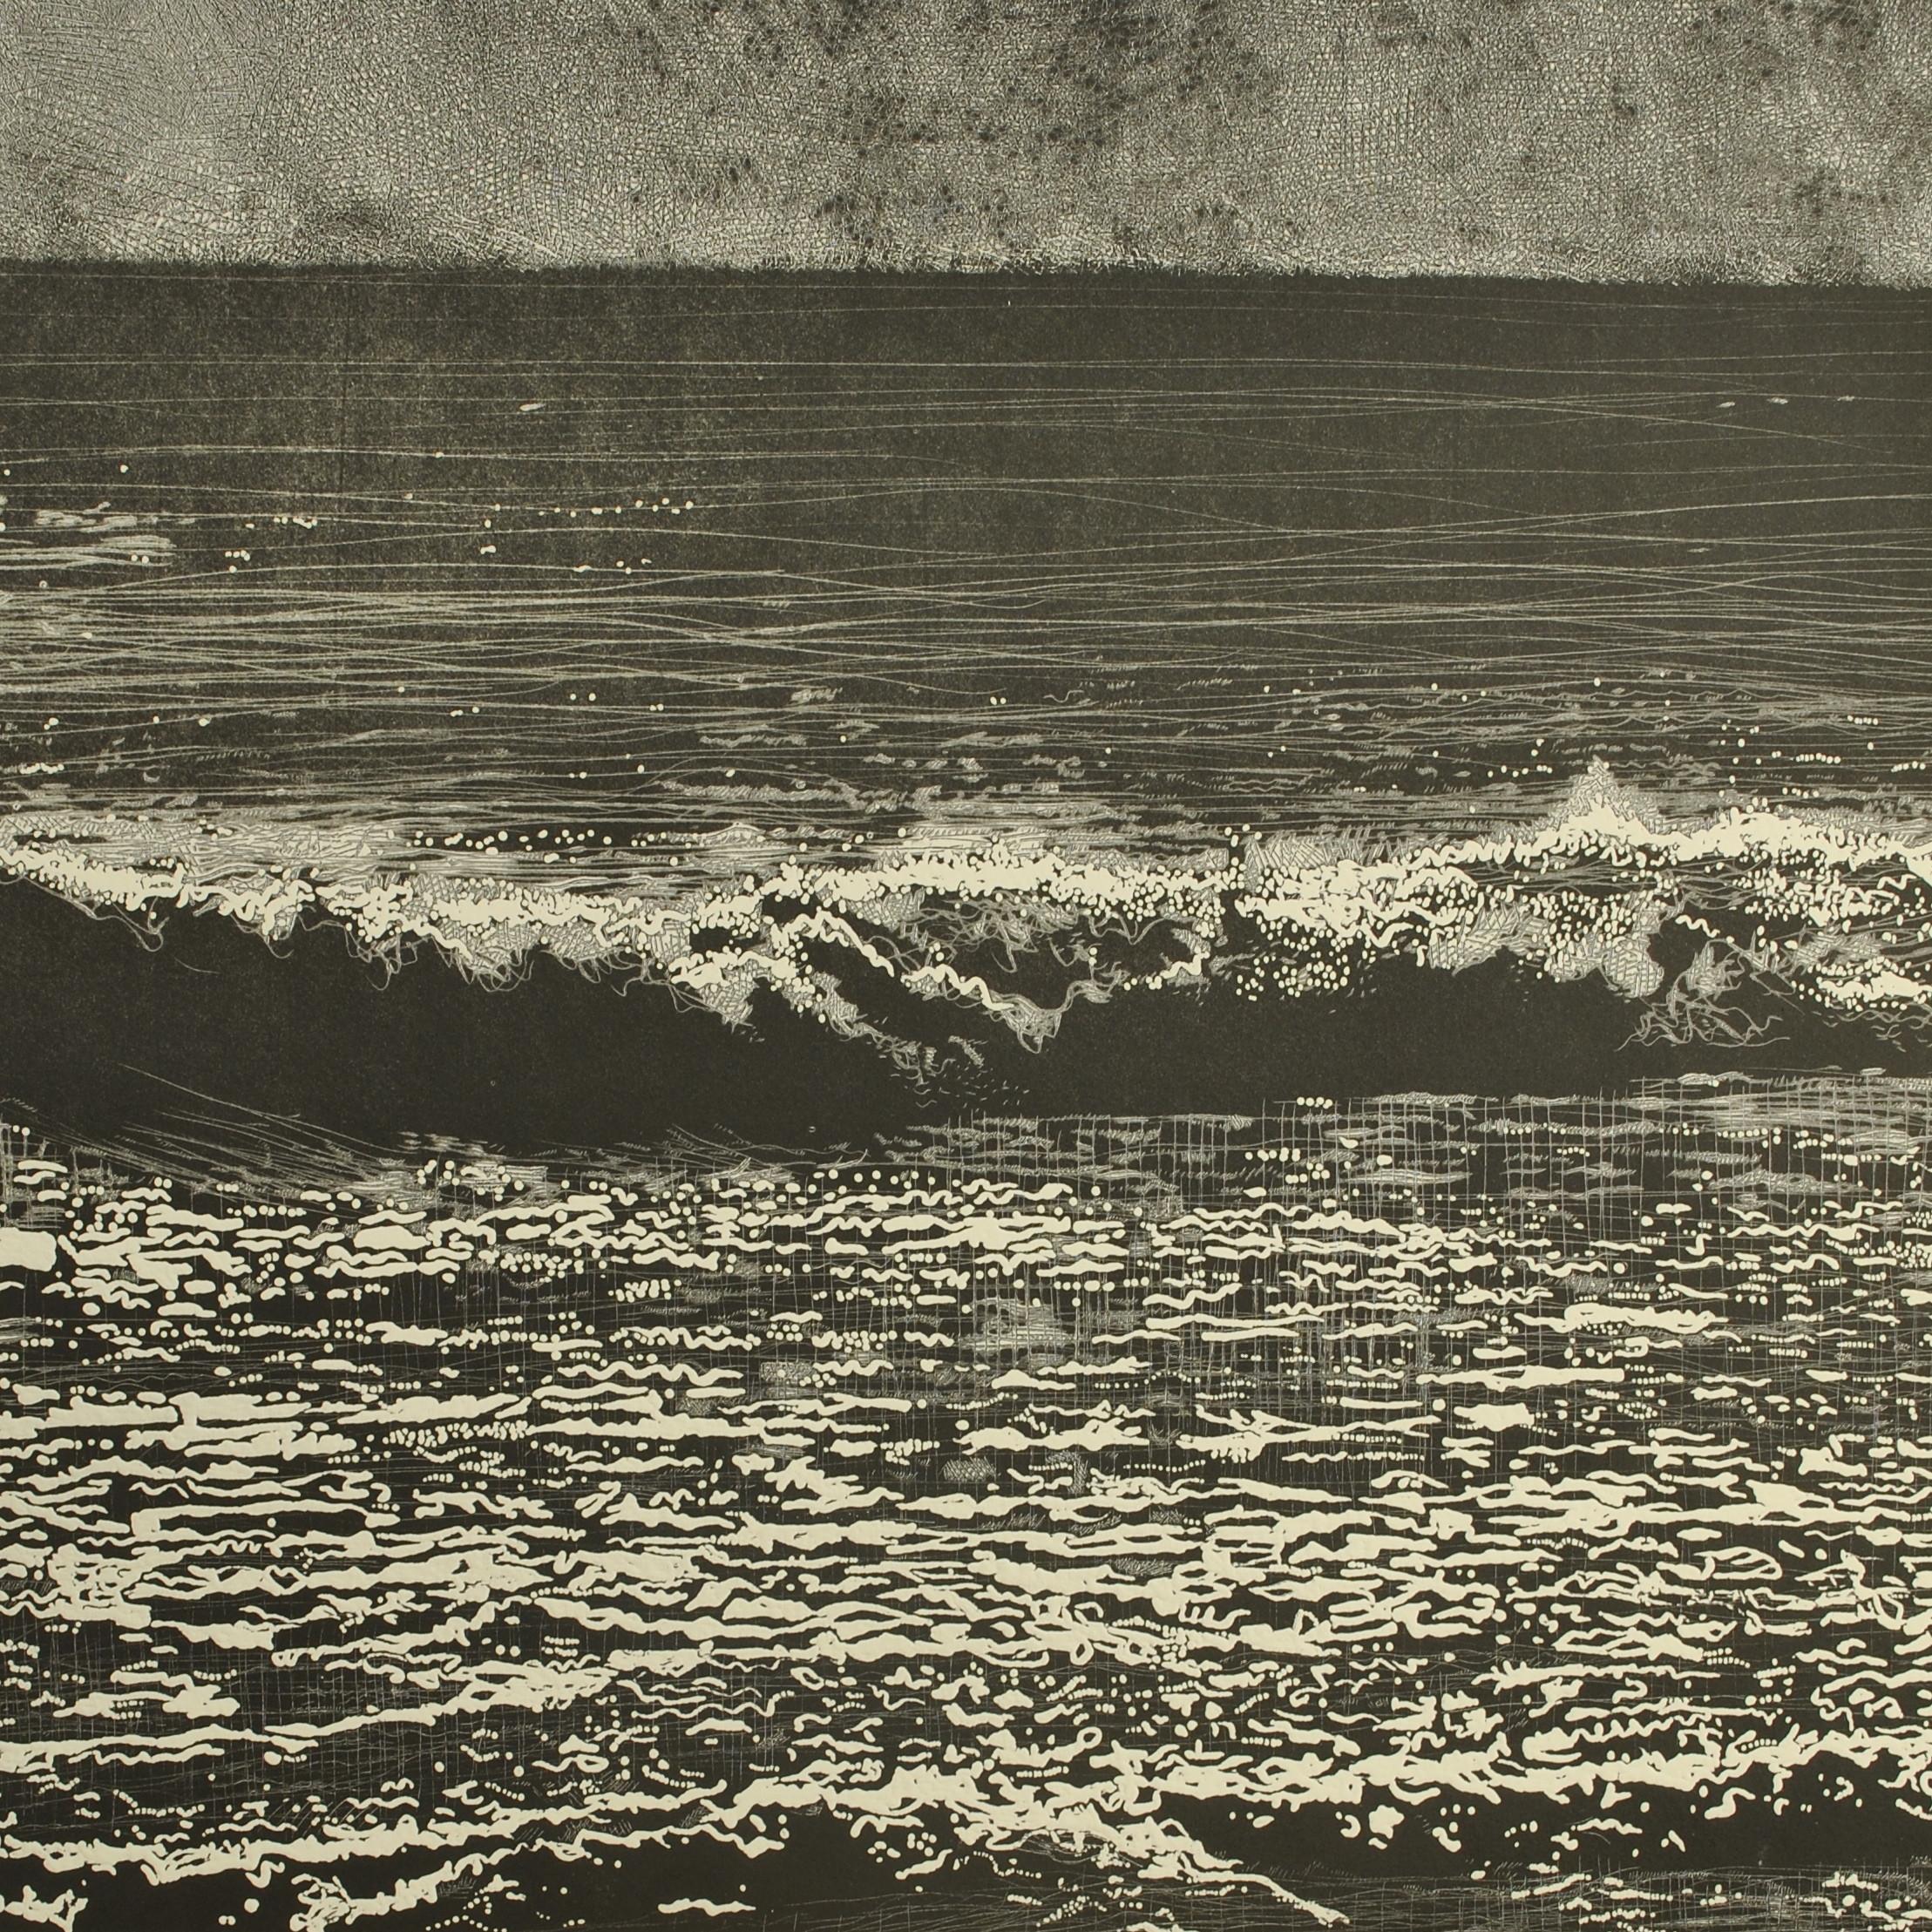 "<span class=""link fancybox-details-link""><a href=""/artists/237-trevor-price/works/6814-trevor-price-storm-waves-v/"">View Detail Page</a></span><div class=""artist""><strong>Trevor Price</strong></div> b. 1966 <div class=""title""><em>Storm Waves V</em></div> <div class=""medium"">Drypoint and engraved relief print</div> <div class=""dimensions"">image size 35.5 x3 5.5cm, frame size 39.5x39.5cm</div> <div class=""edition_details"">Edition of 100 plus 1 artist's proof</div><div class=""price"">£200.00</div><div class=""copyright_line"">Copyright The Artist</div>"